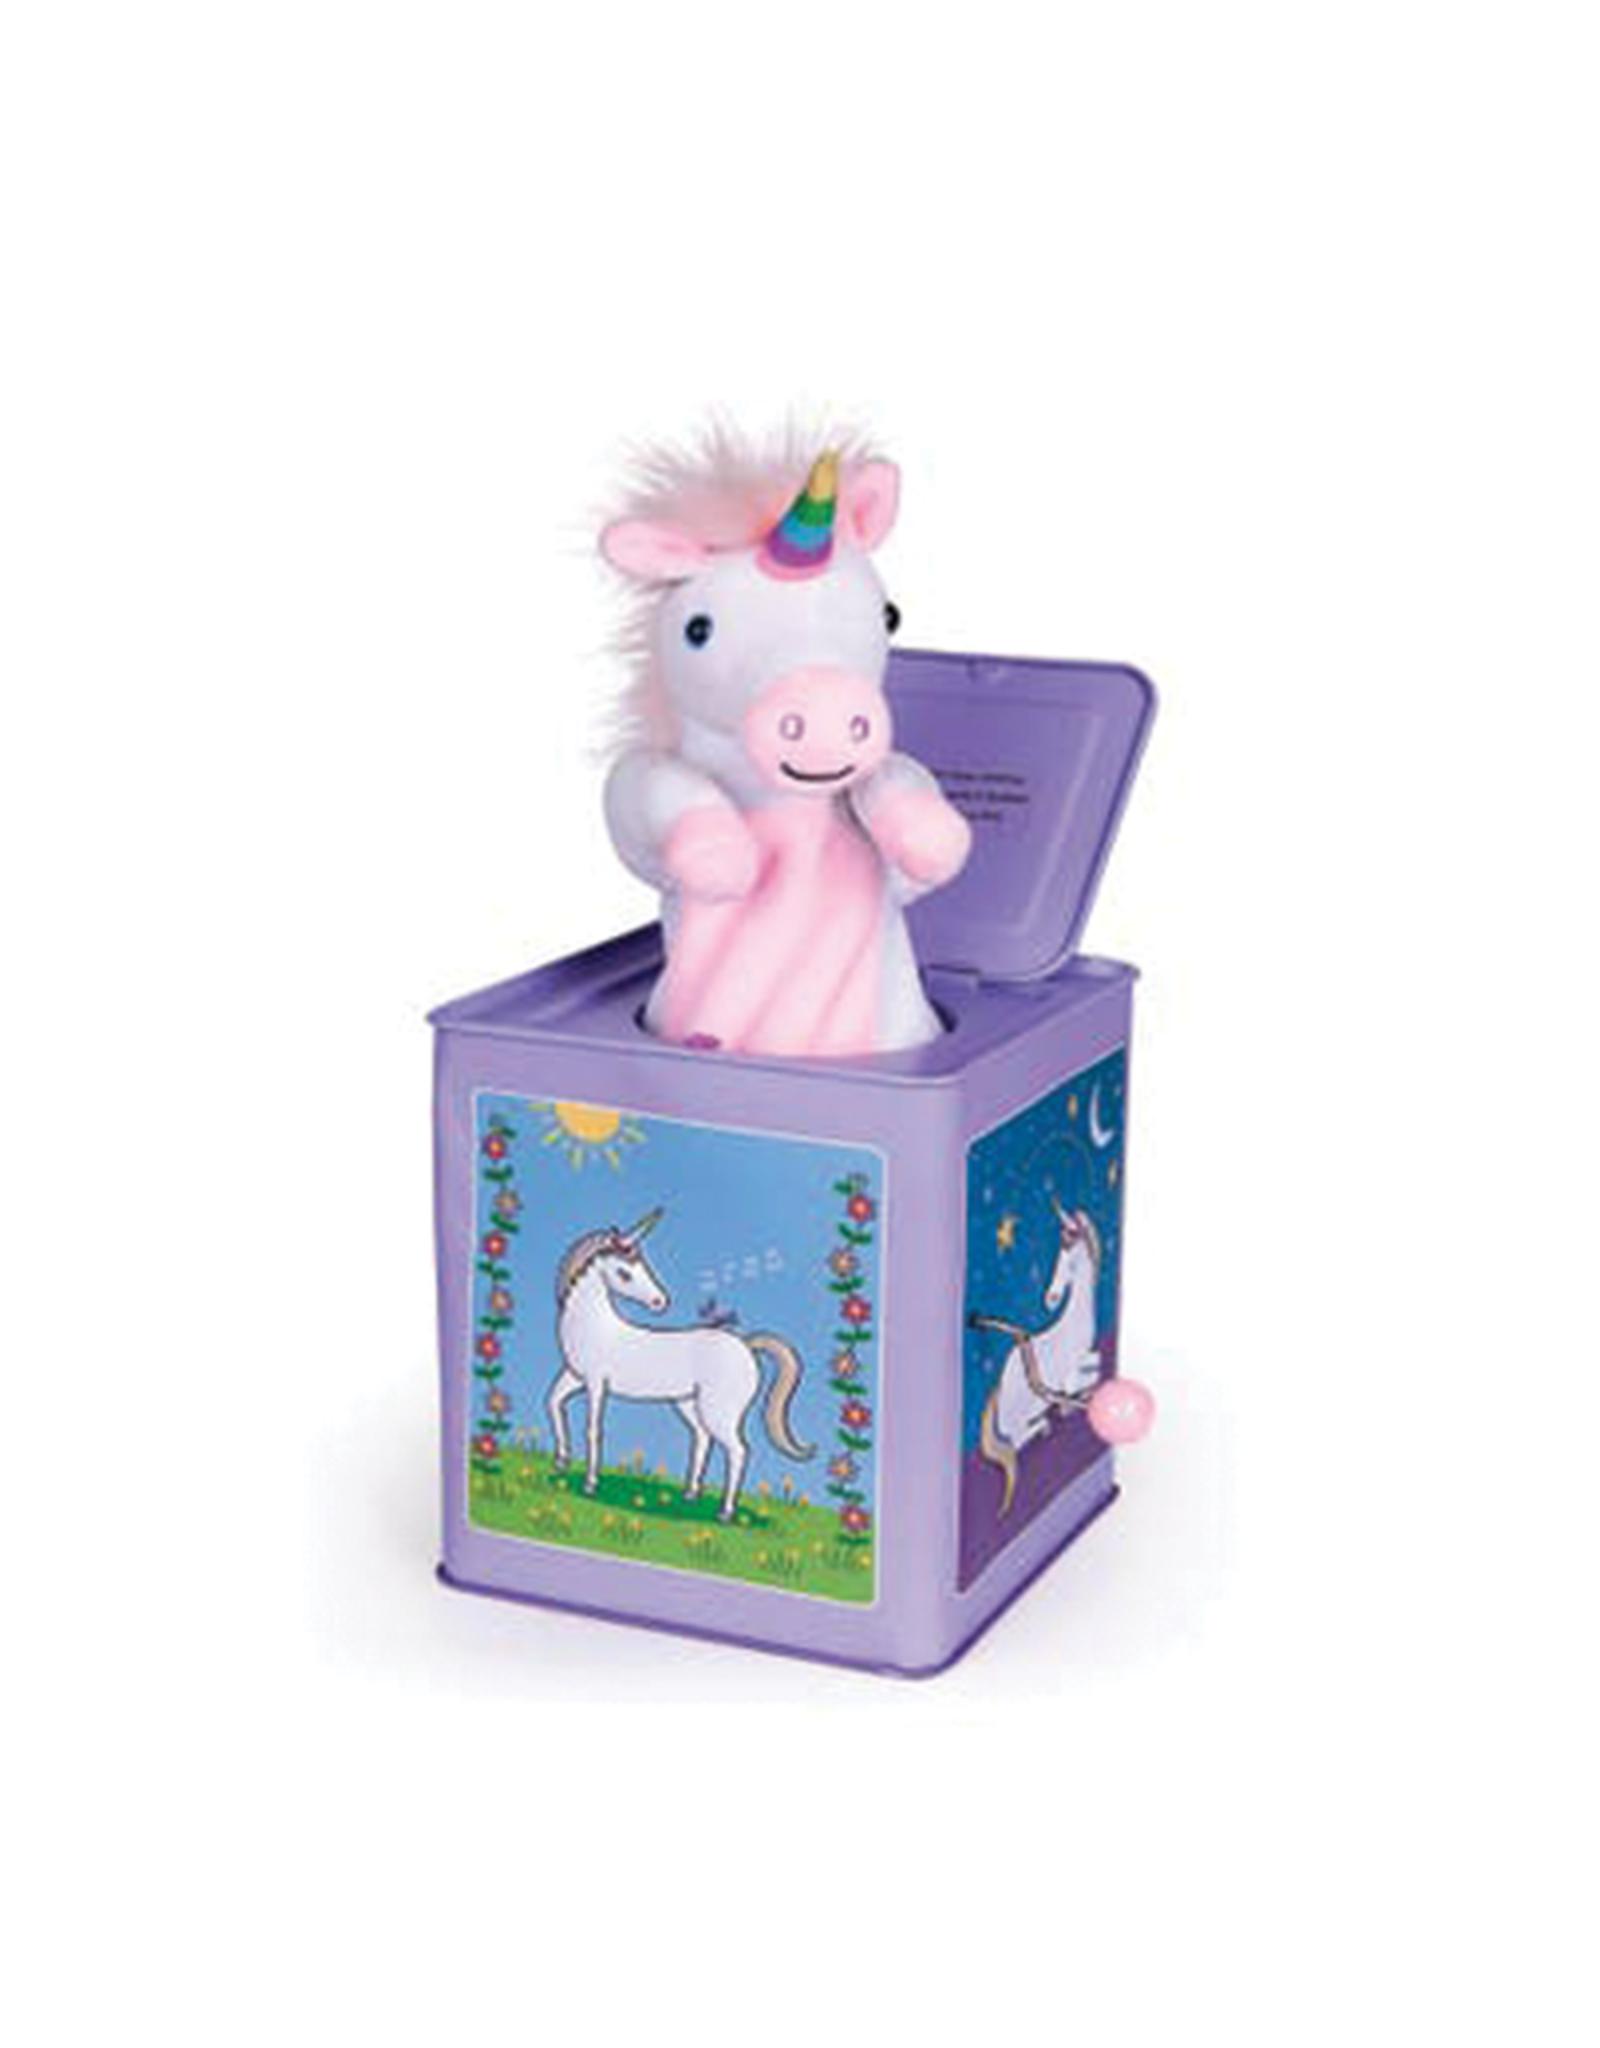 Jack Rabbit Creations Unicorn Jack-in-the-Box